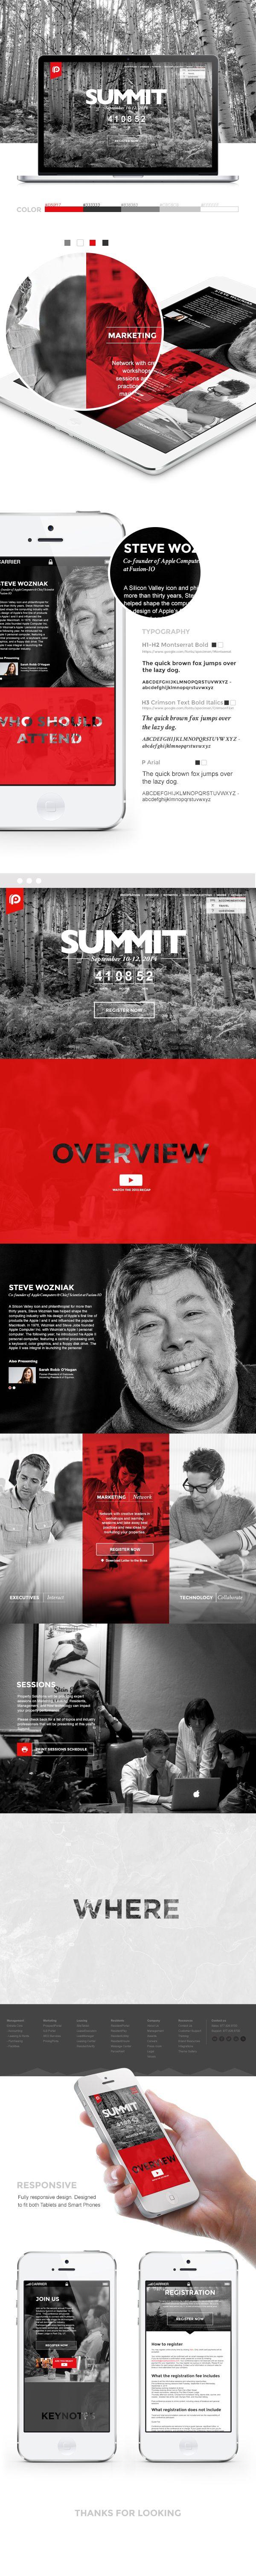 Responsive Summit Web Design by Josh Mendenhall, via Behance